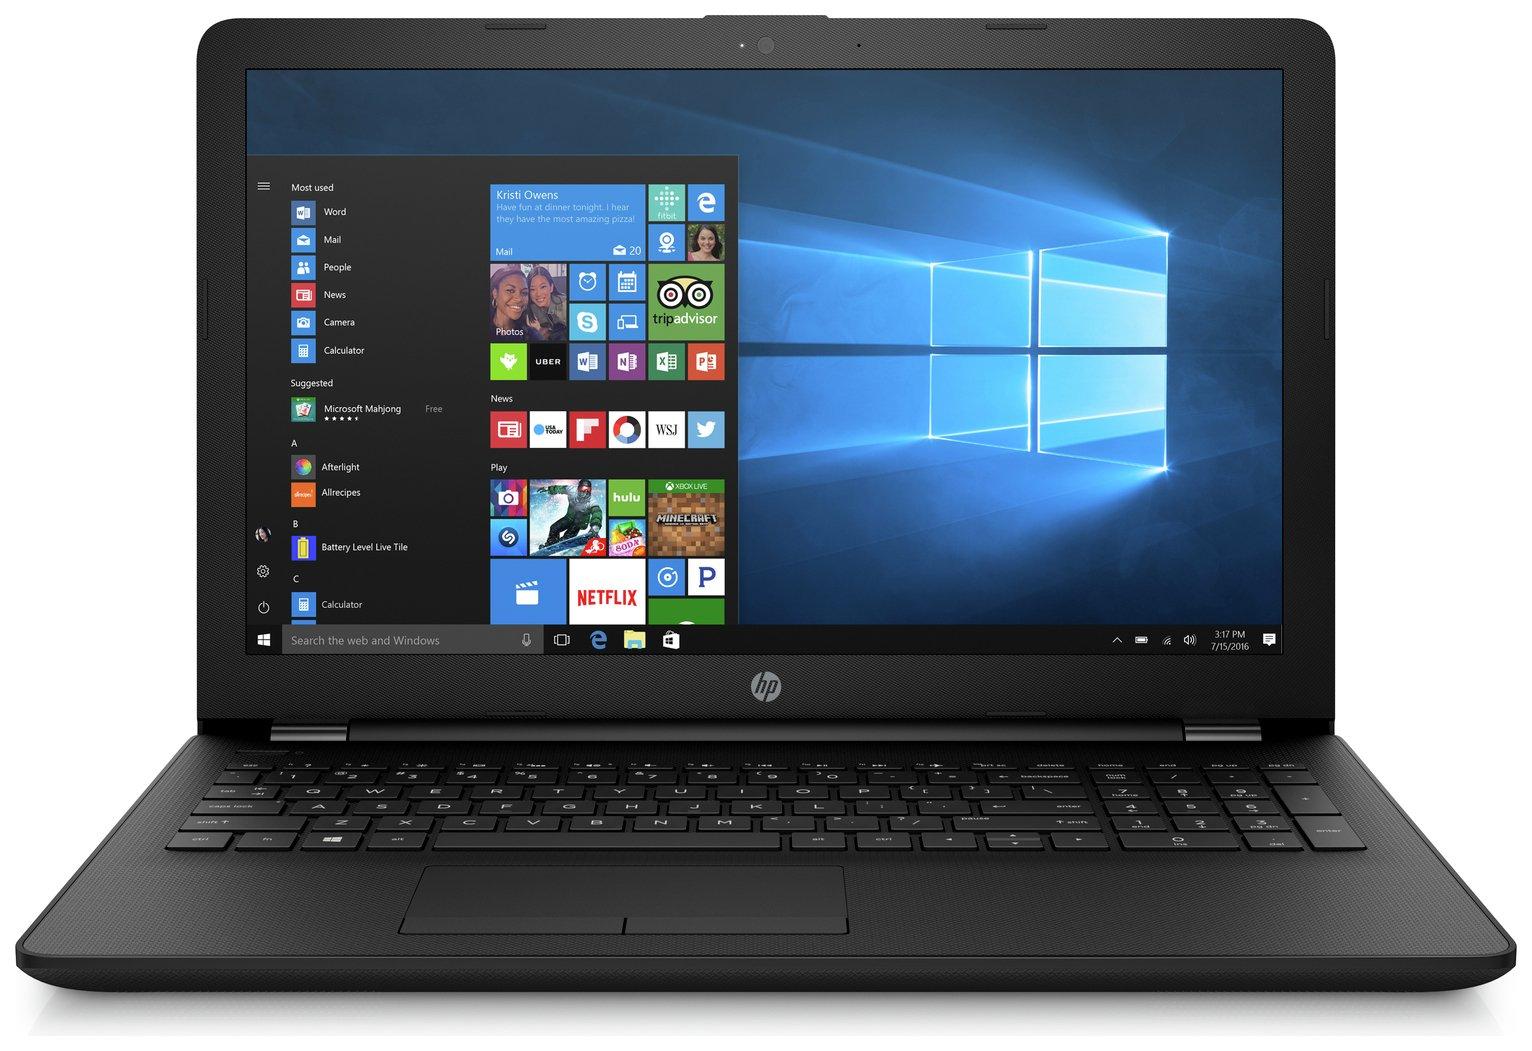 HP 15.6 Inch Intel Celeron 4GB 1TB Full HD Laptop - Black